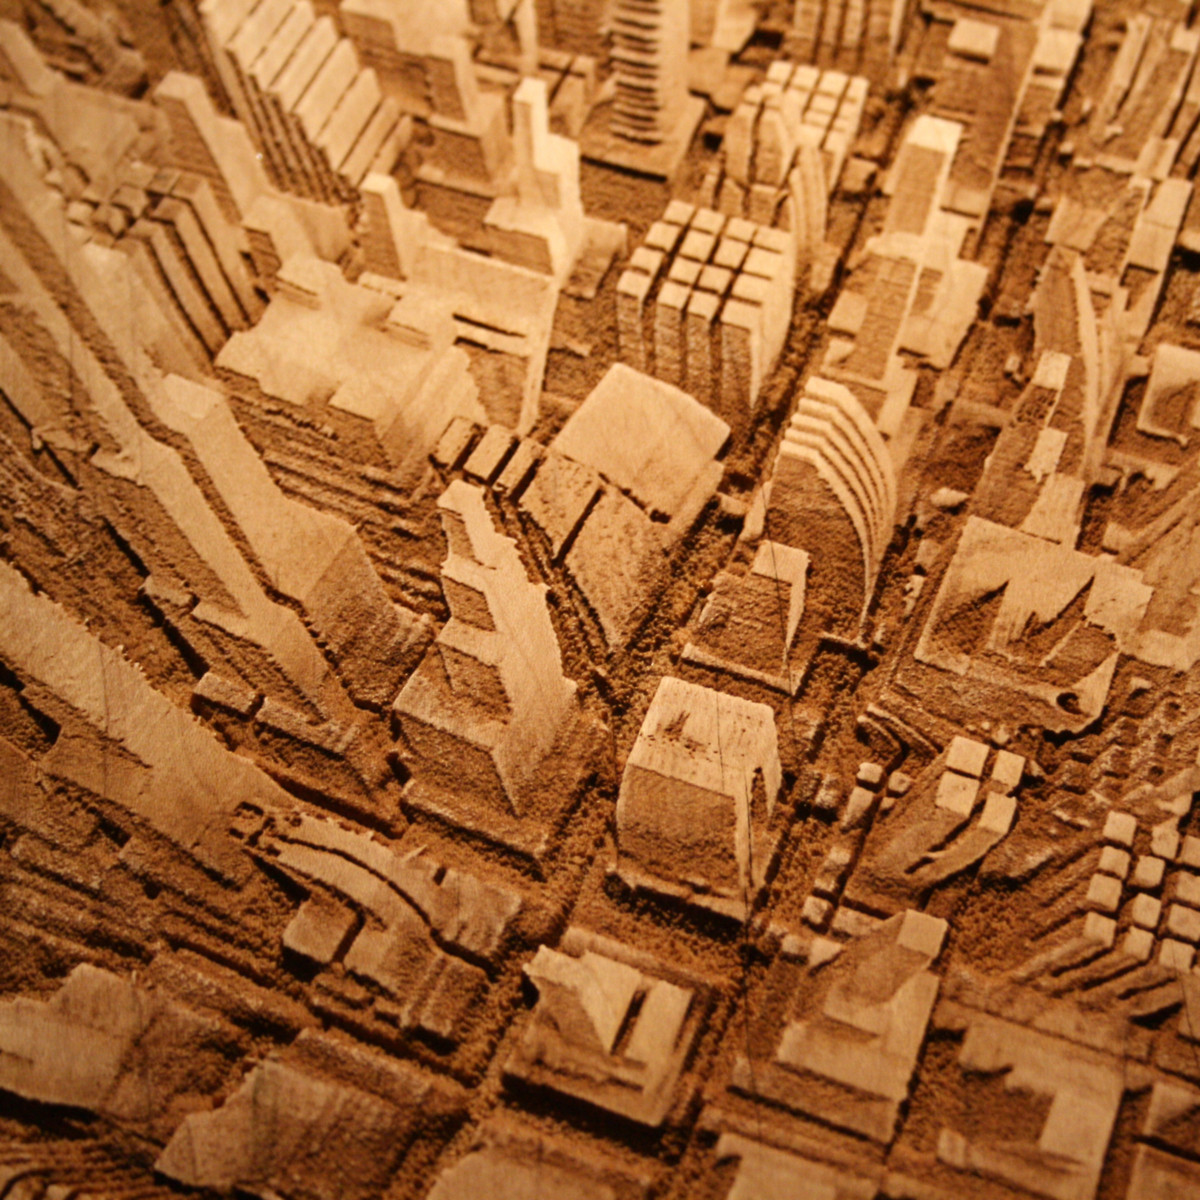 Galer a de arte y arquitectura paisajes urbanos en madera - Arquitectura en madera ...